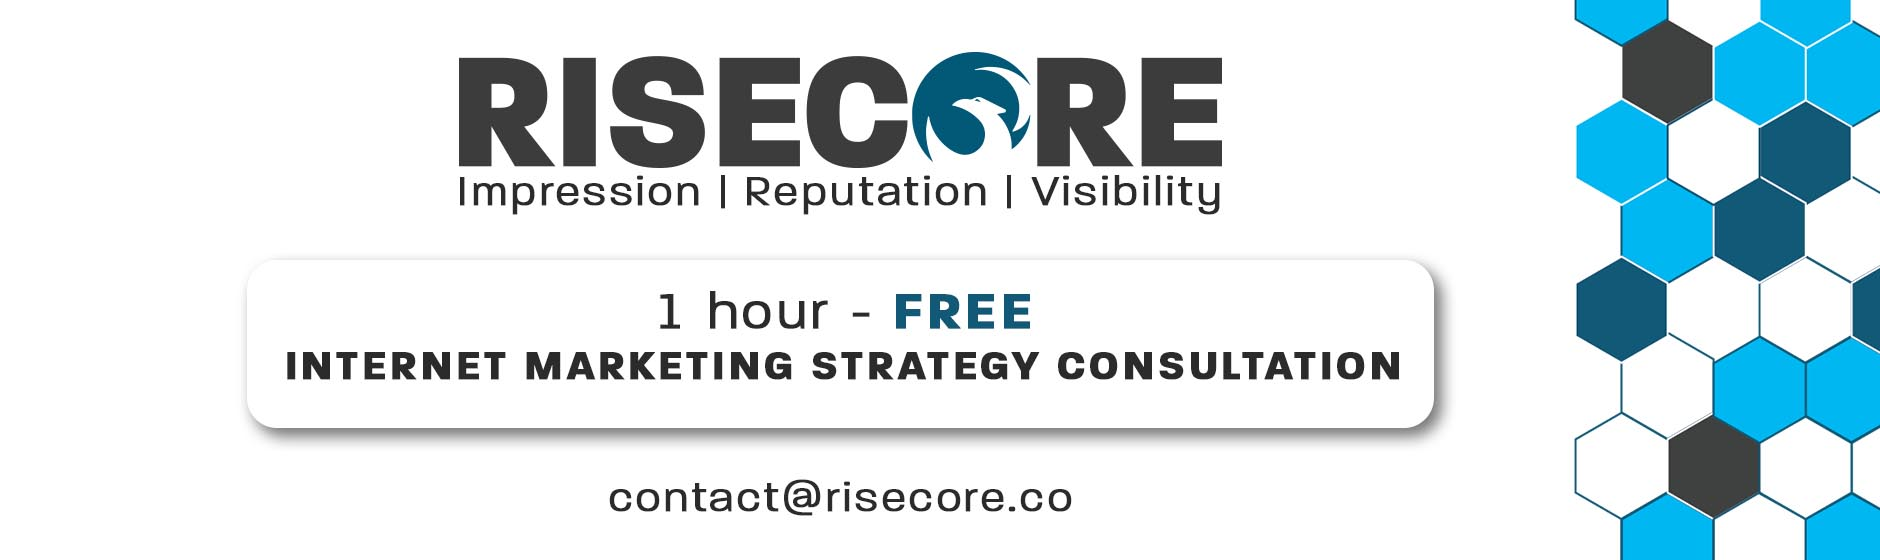 Free 1 Hour Social Media Marketing Consultation - contact@risecore.co